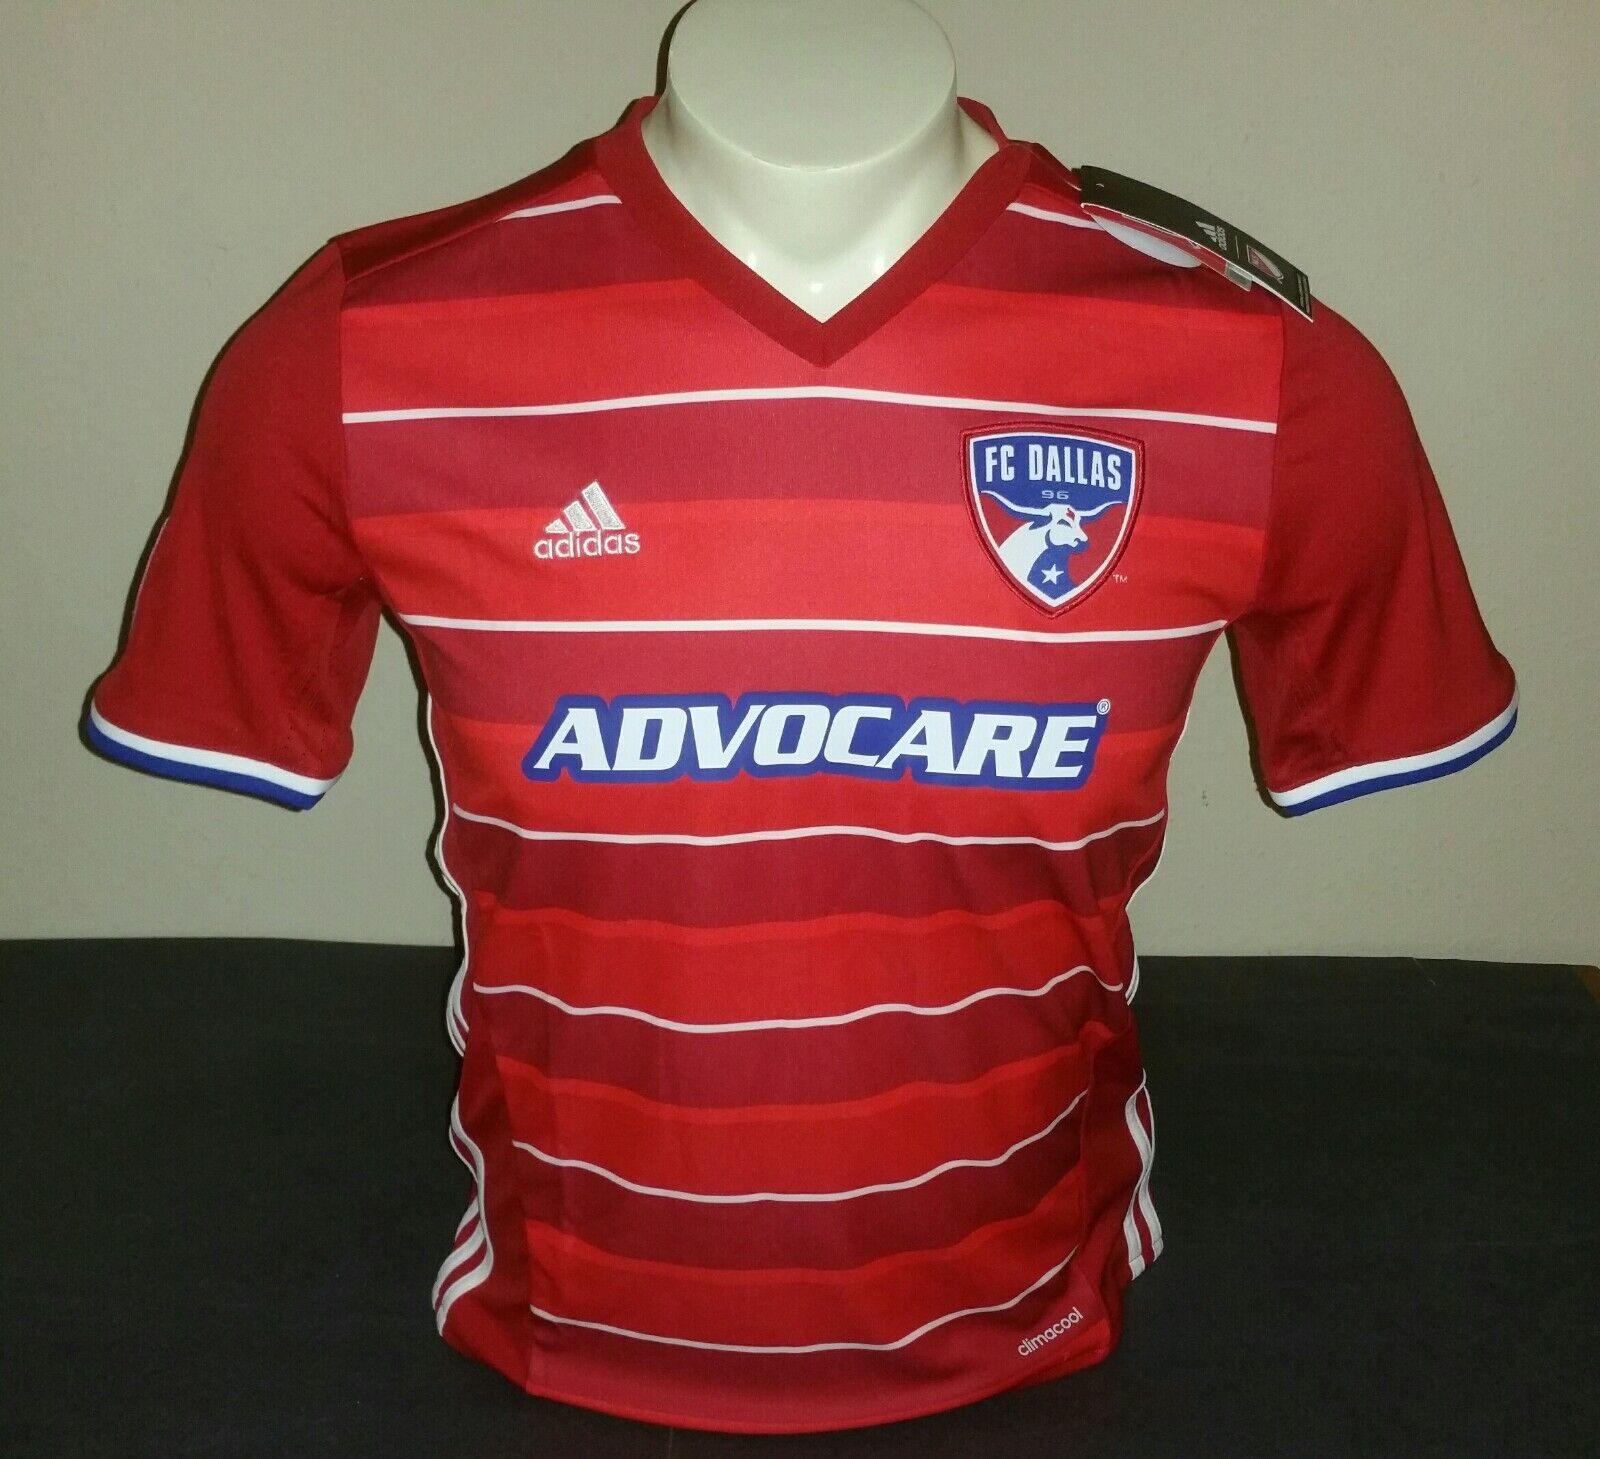 cab0bfc7c3f Adidas Youth FC Dallas Dallas Dallas Home Jersey 15 16, Red blueee White,  Size YL fcbede